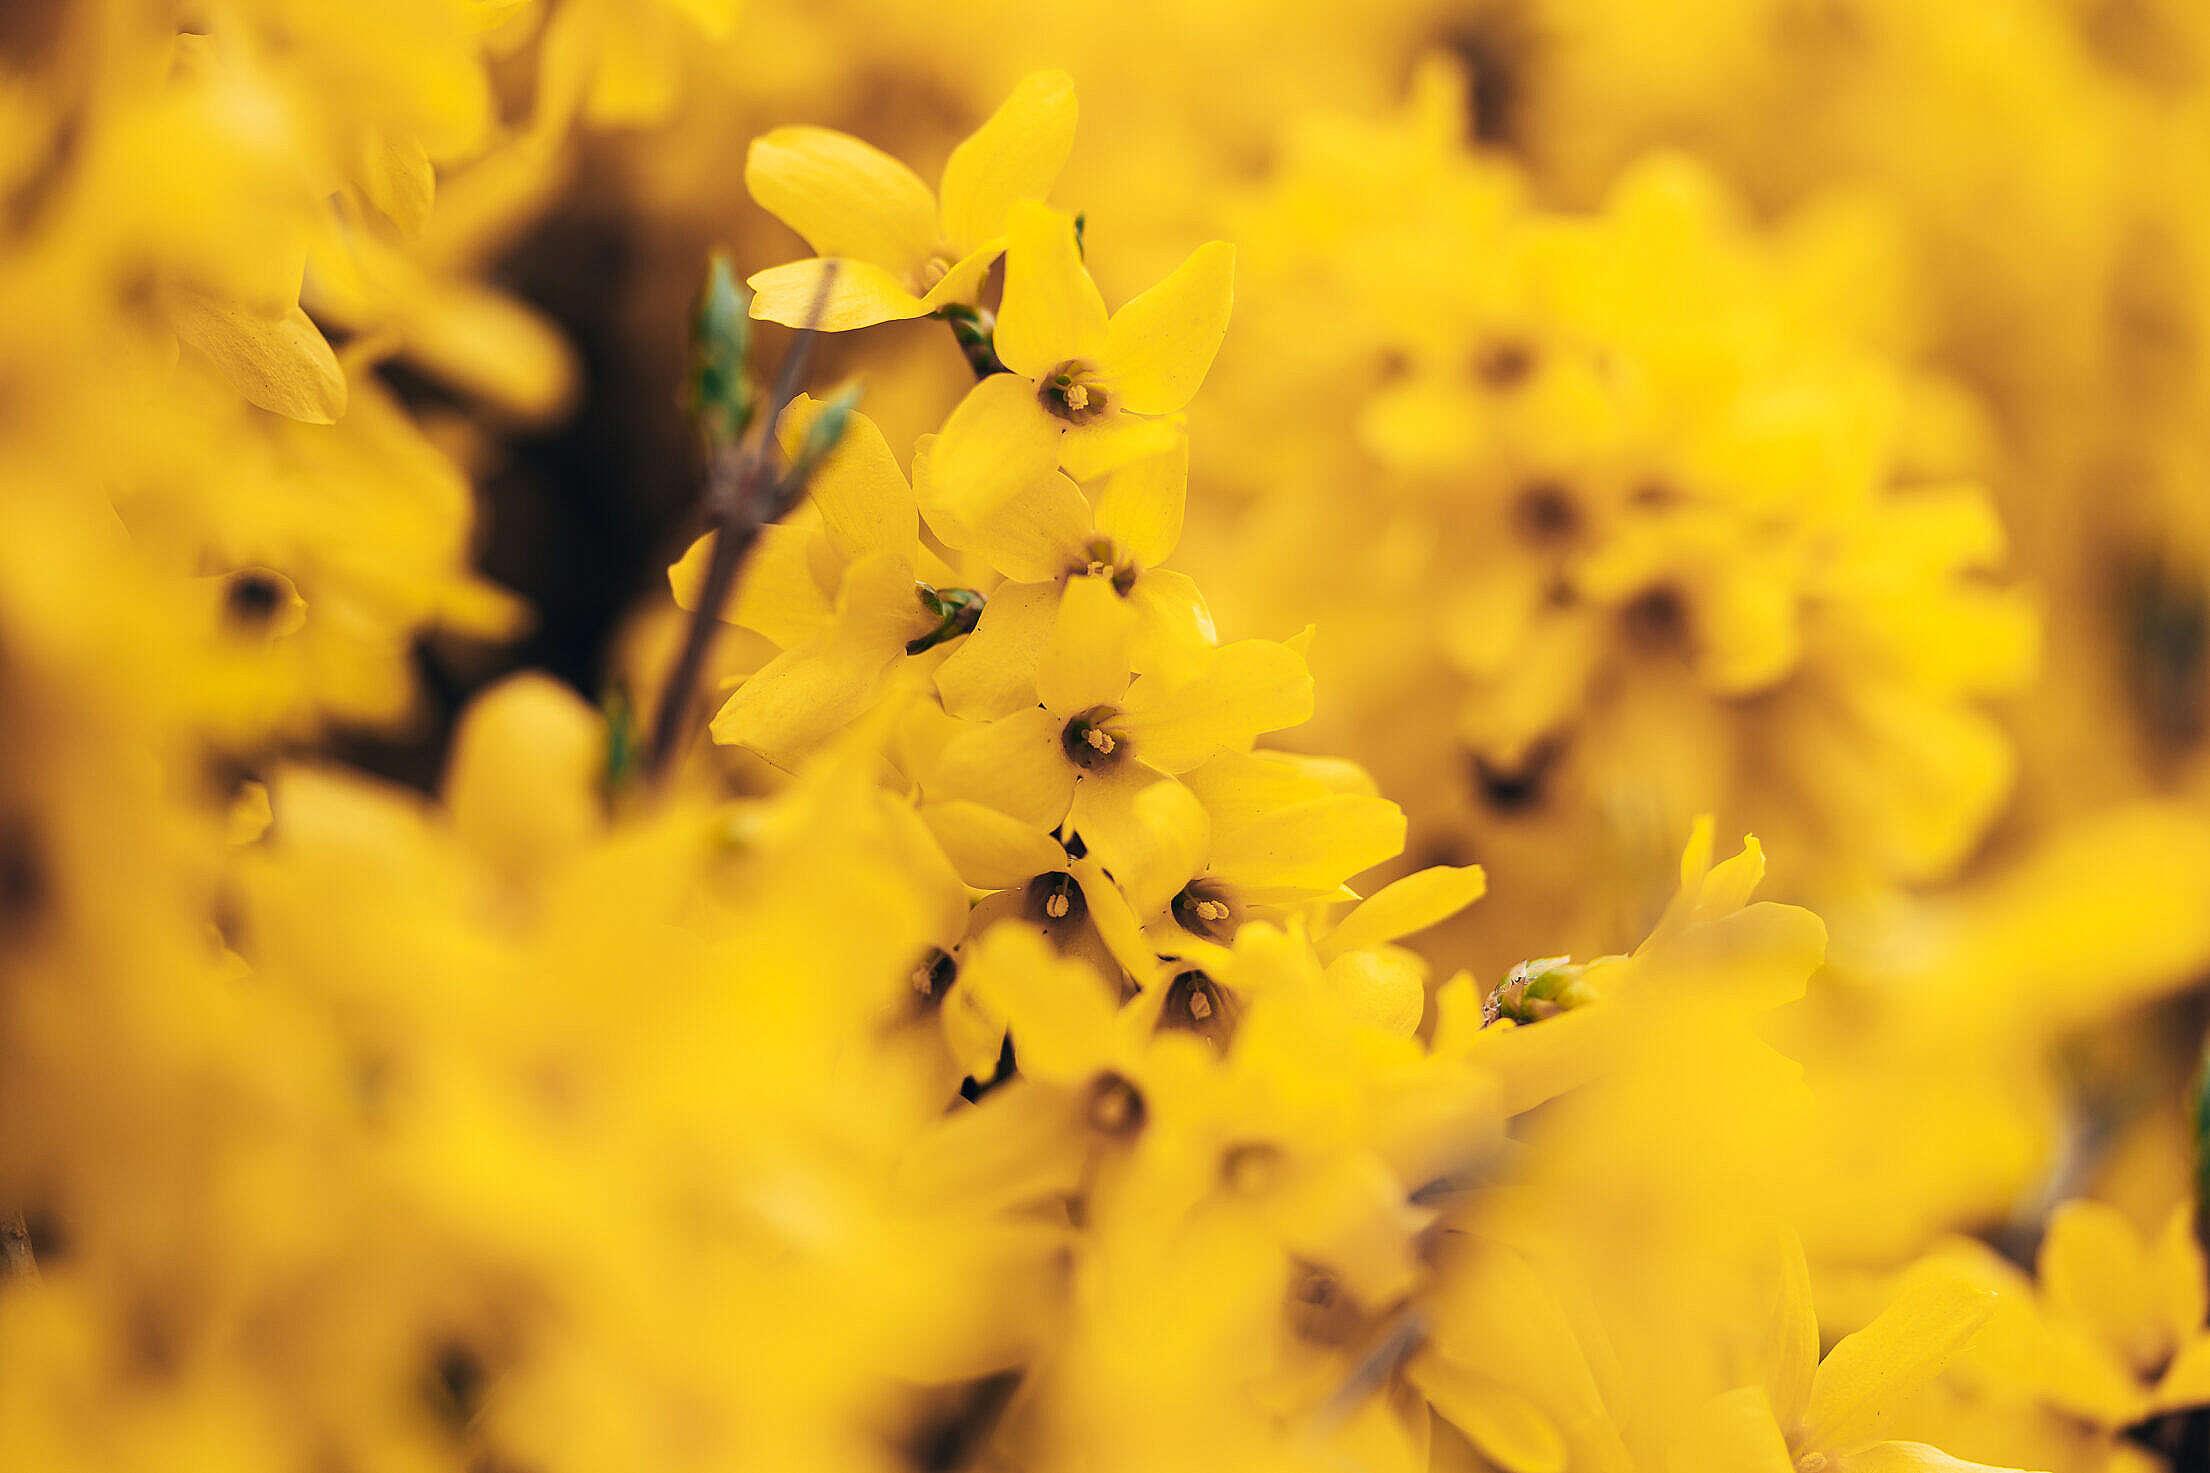 Forsythia Blossoms Close Up Free Stock Photo